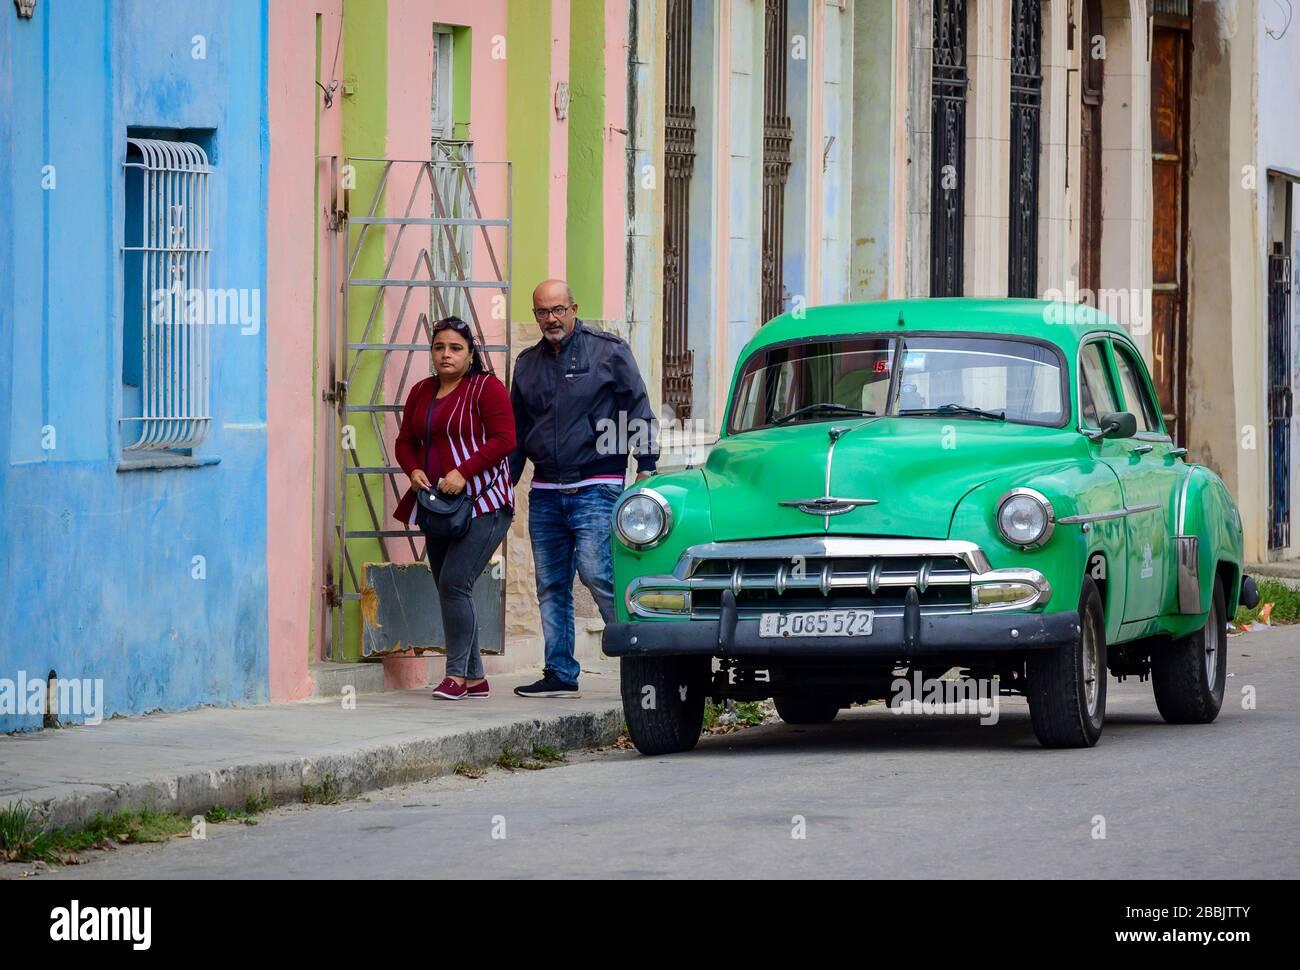 Viejo Chevrolet y pareja de paso, la Habana, Cuba Foto de stock